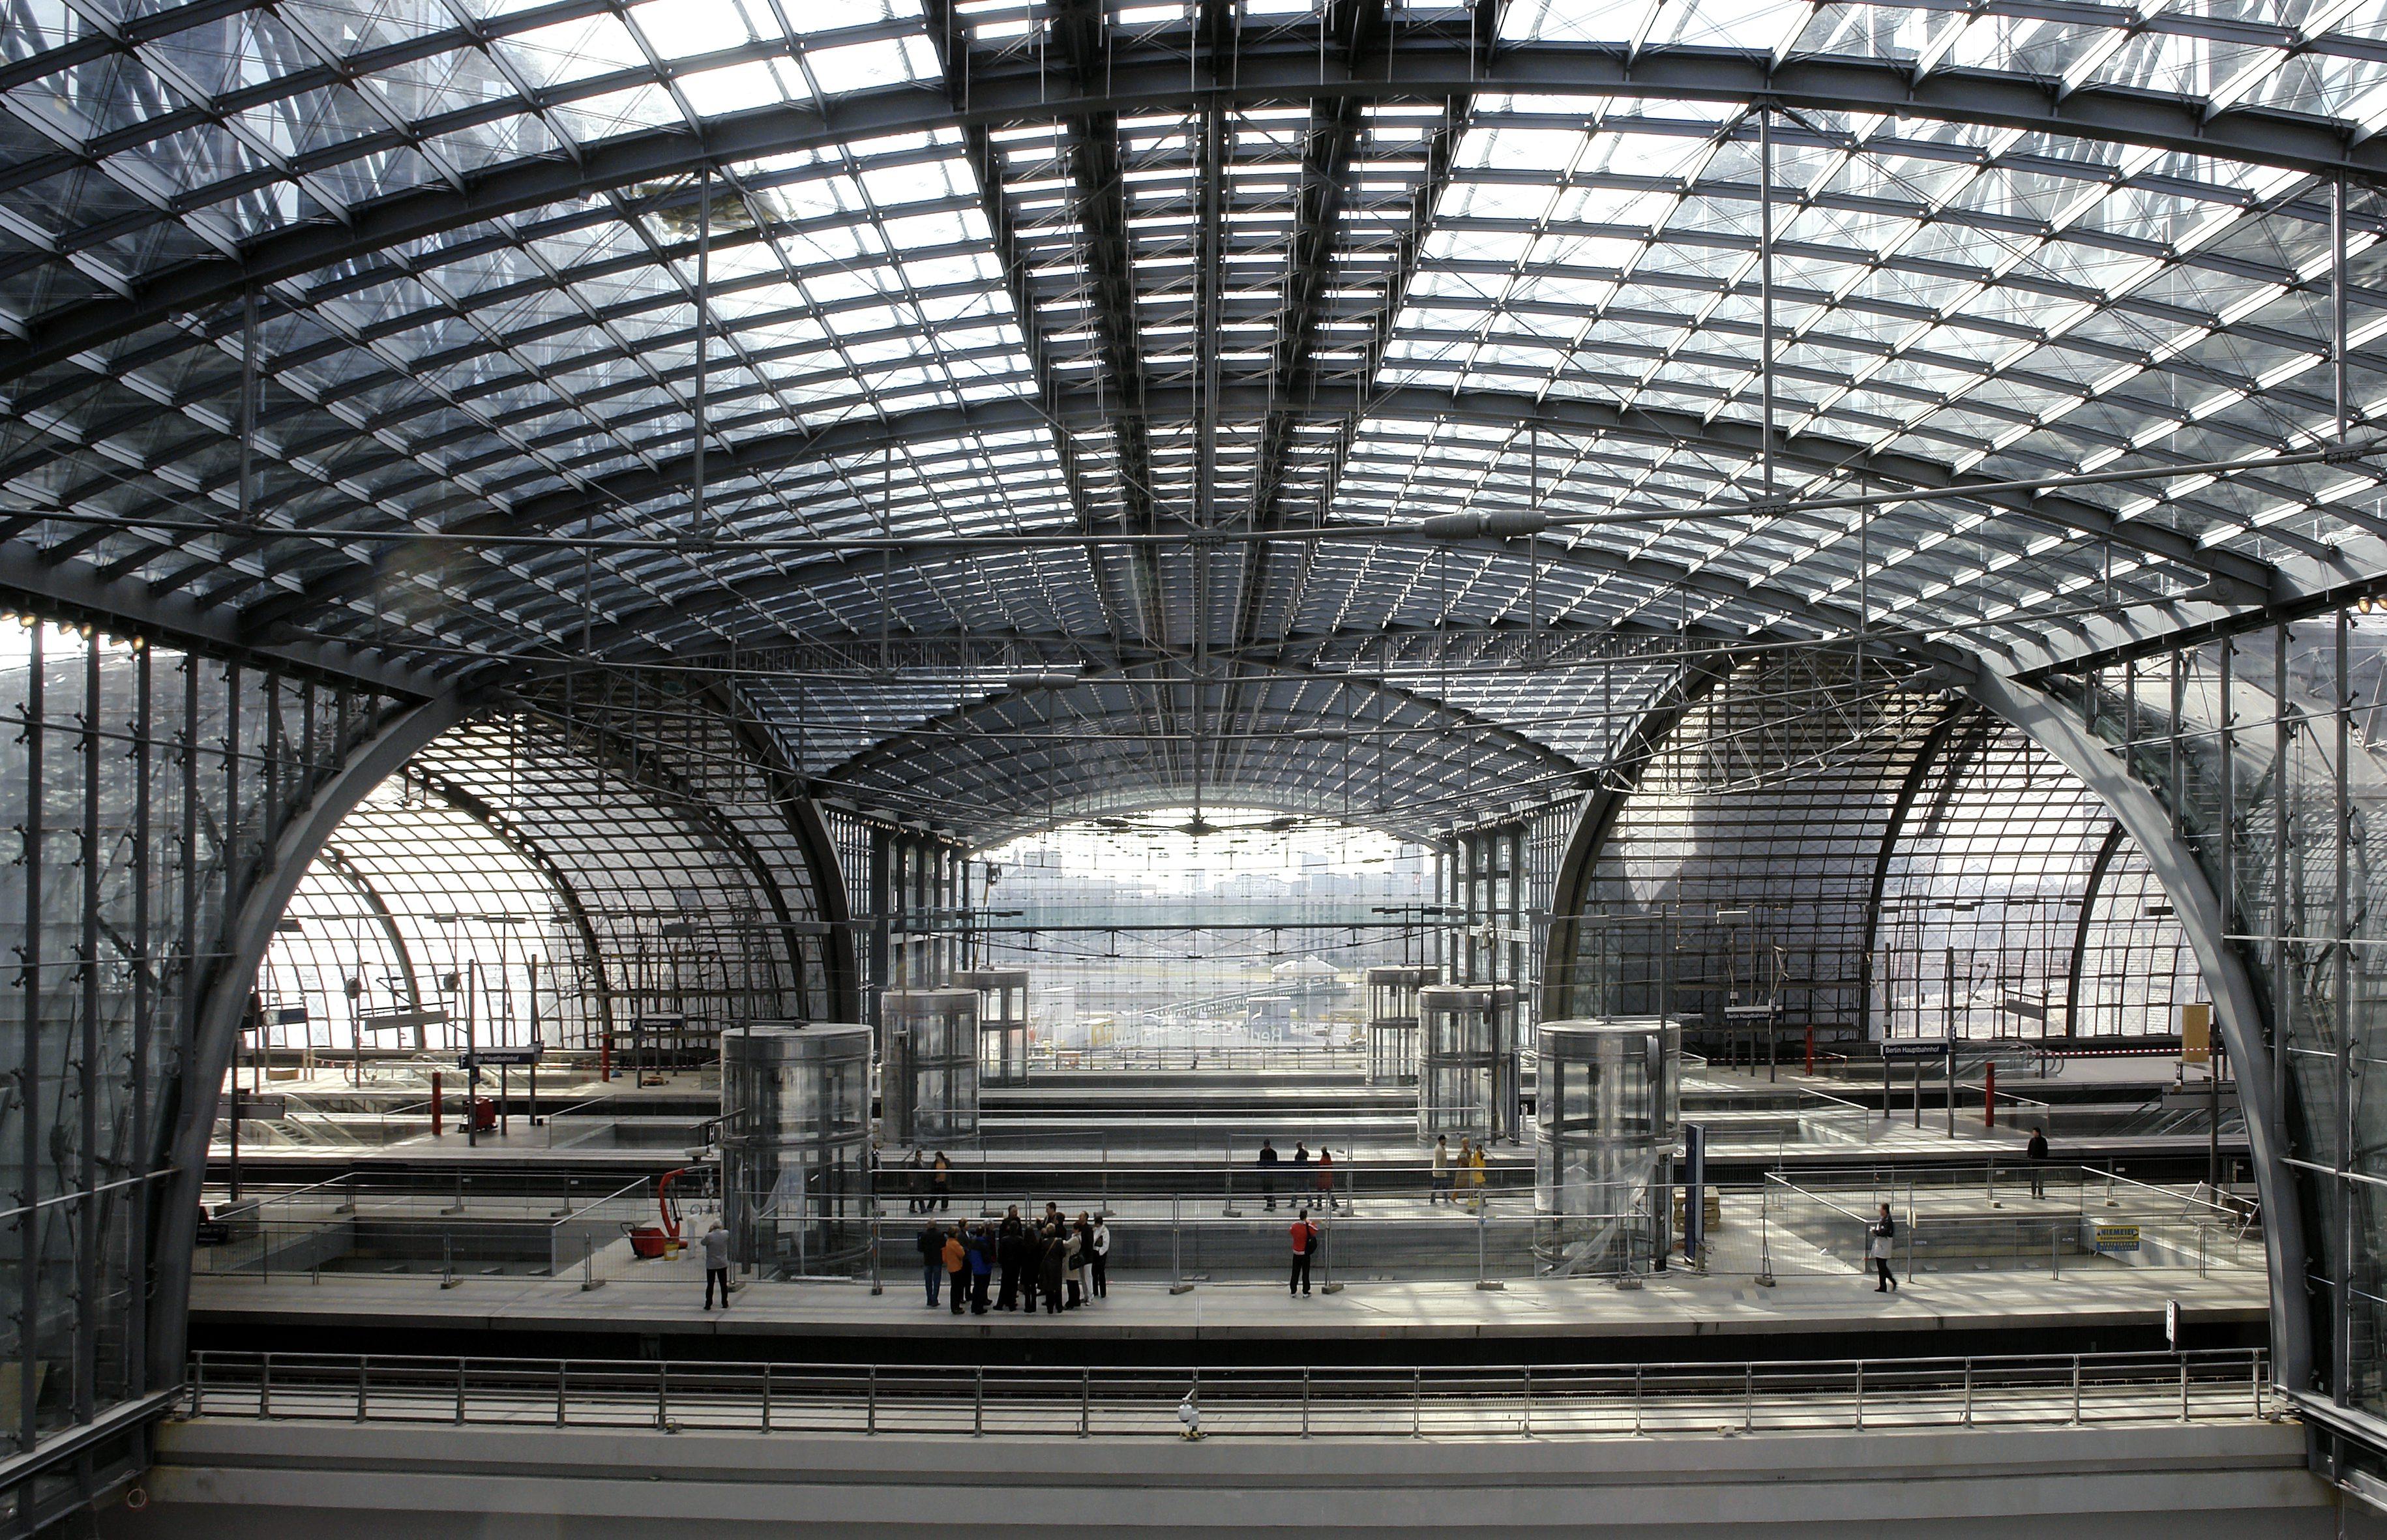 Berlin Hauptbahnhof - Lehrter Bahnhof: www.jobakeronline.com/articles/architecture-week